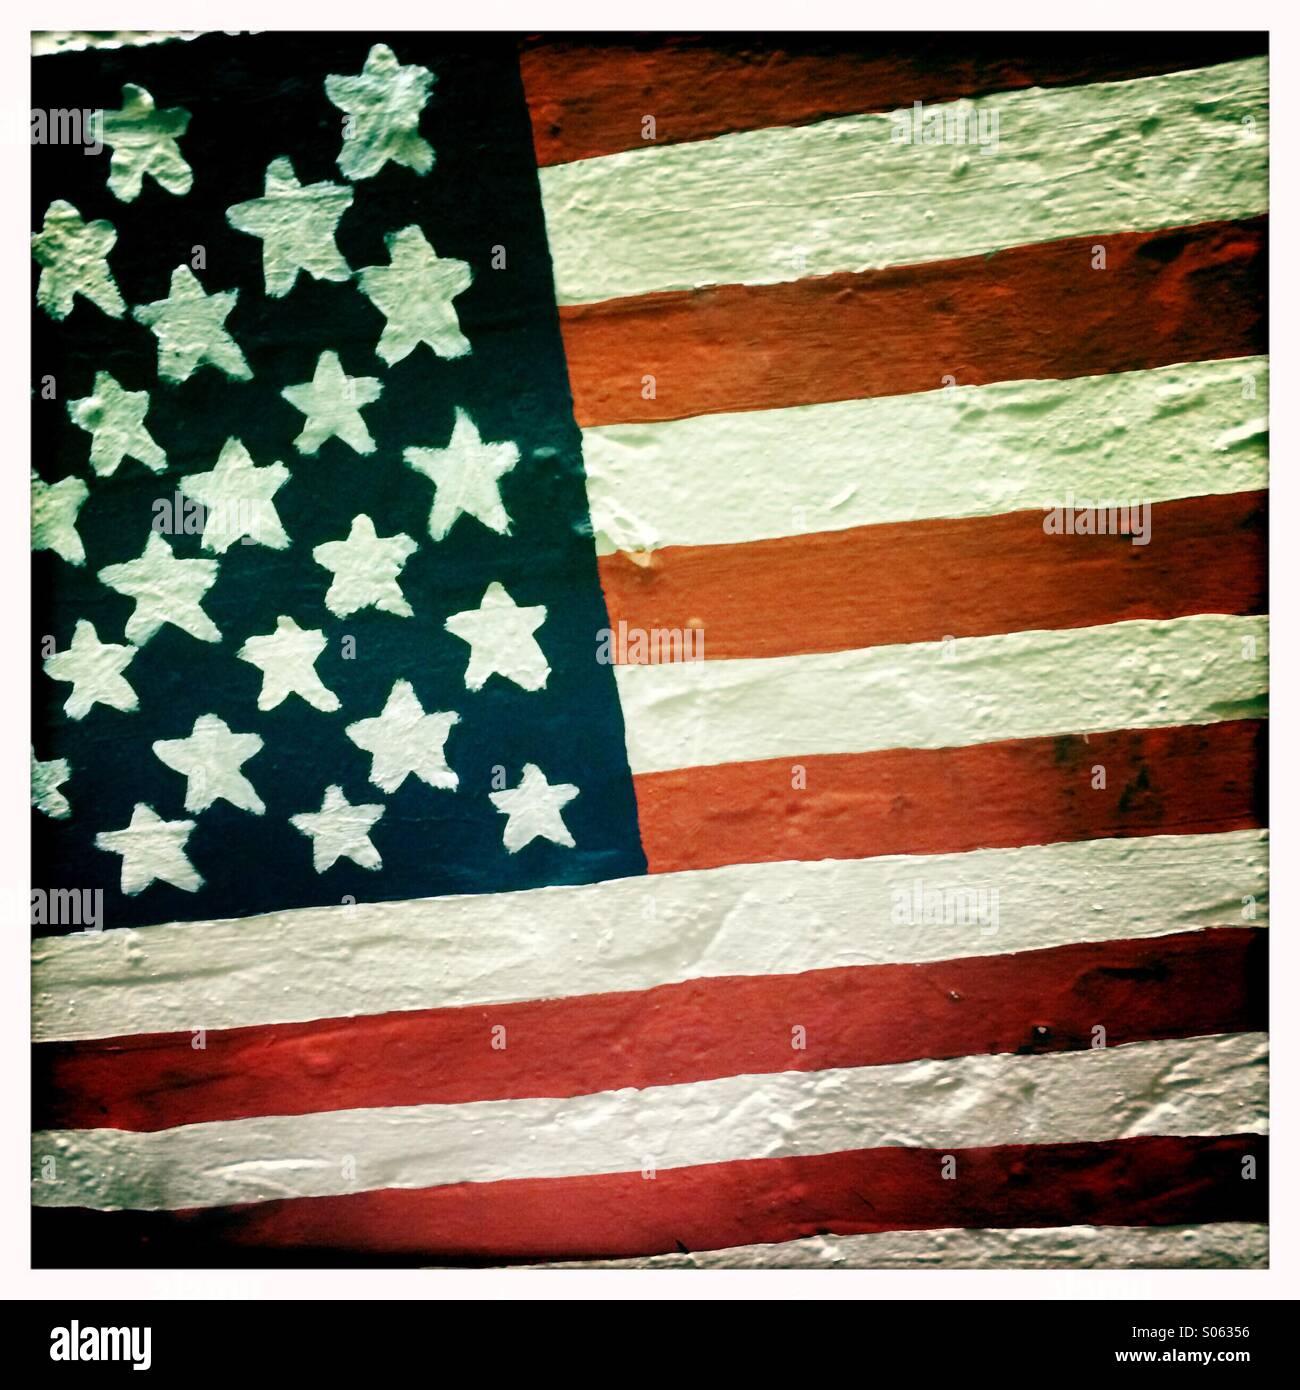 Graffiti American flag - Stock Image